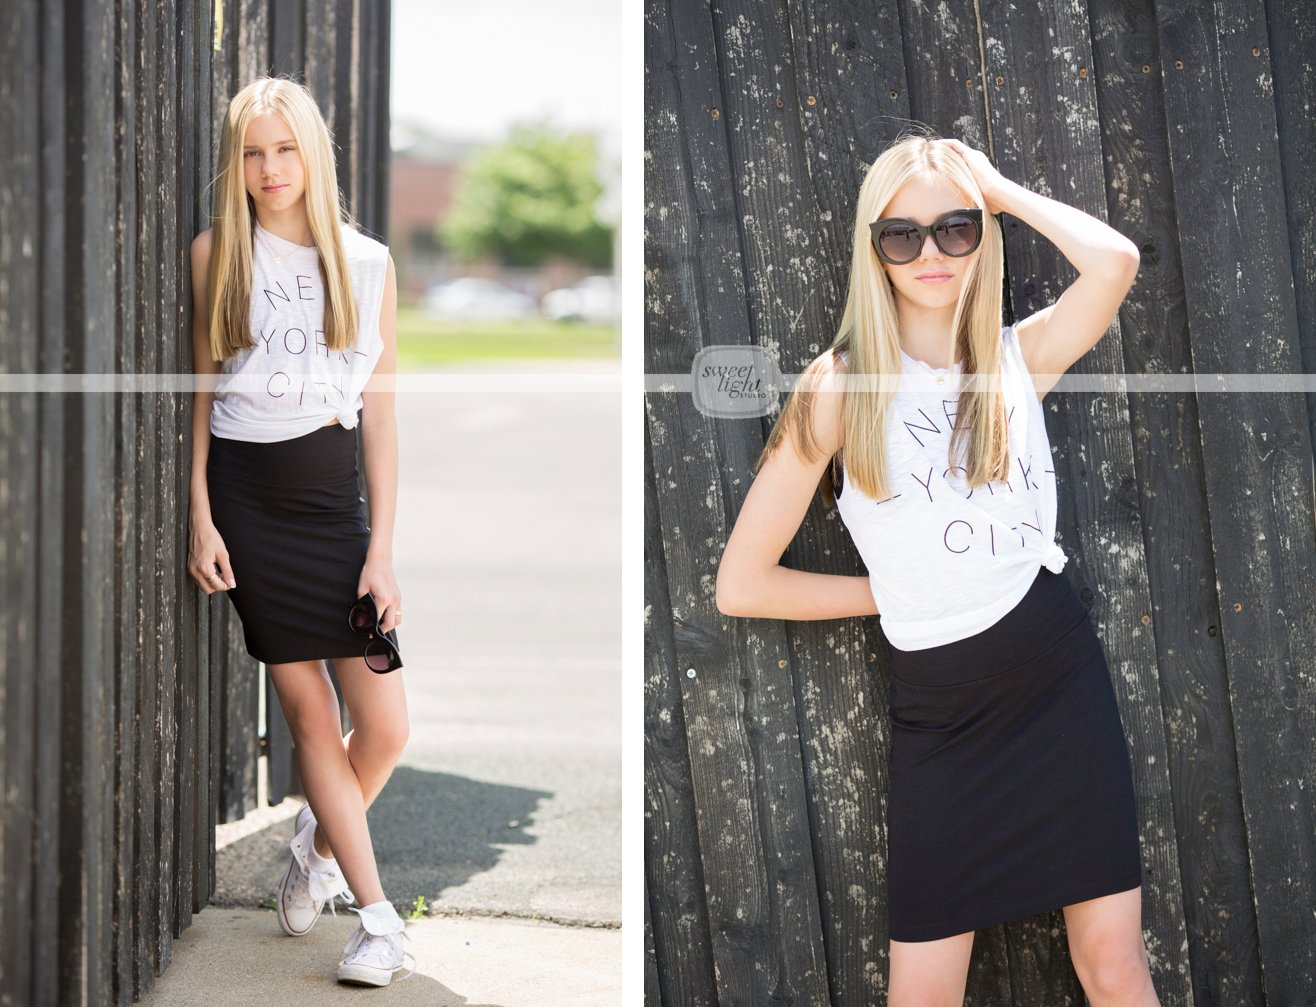 Teen models picatures